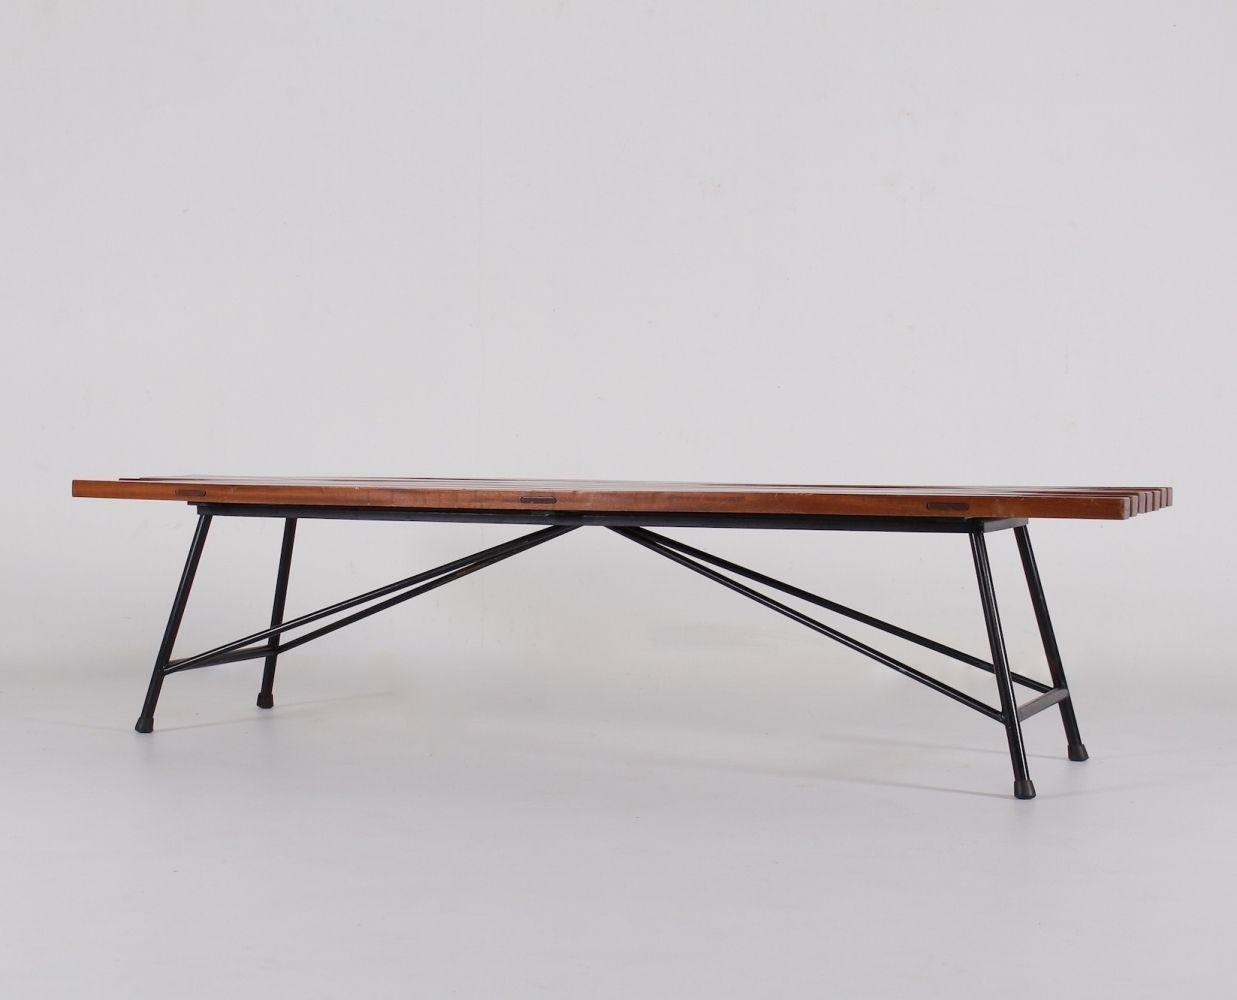 For Sale Modernist Bench By Alain Richard For Meubles Tv Modernist Folding Table Bench